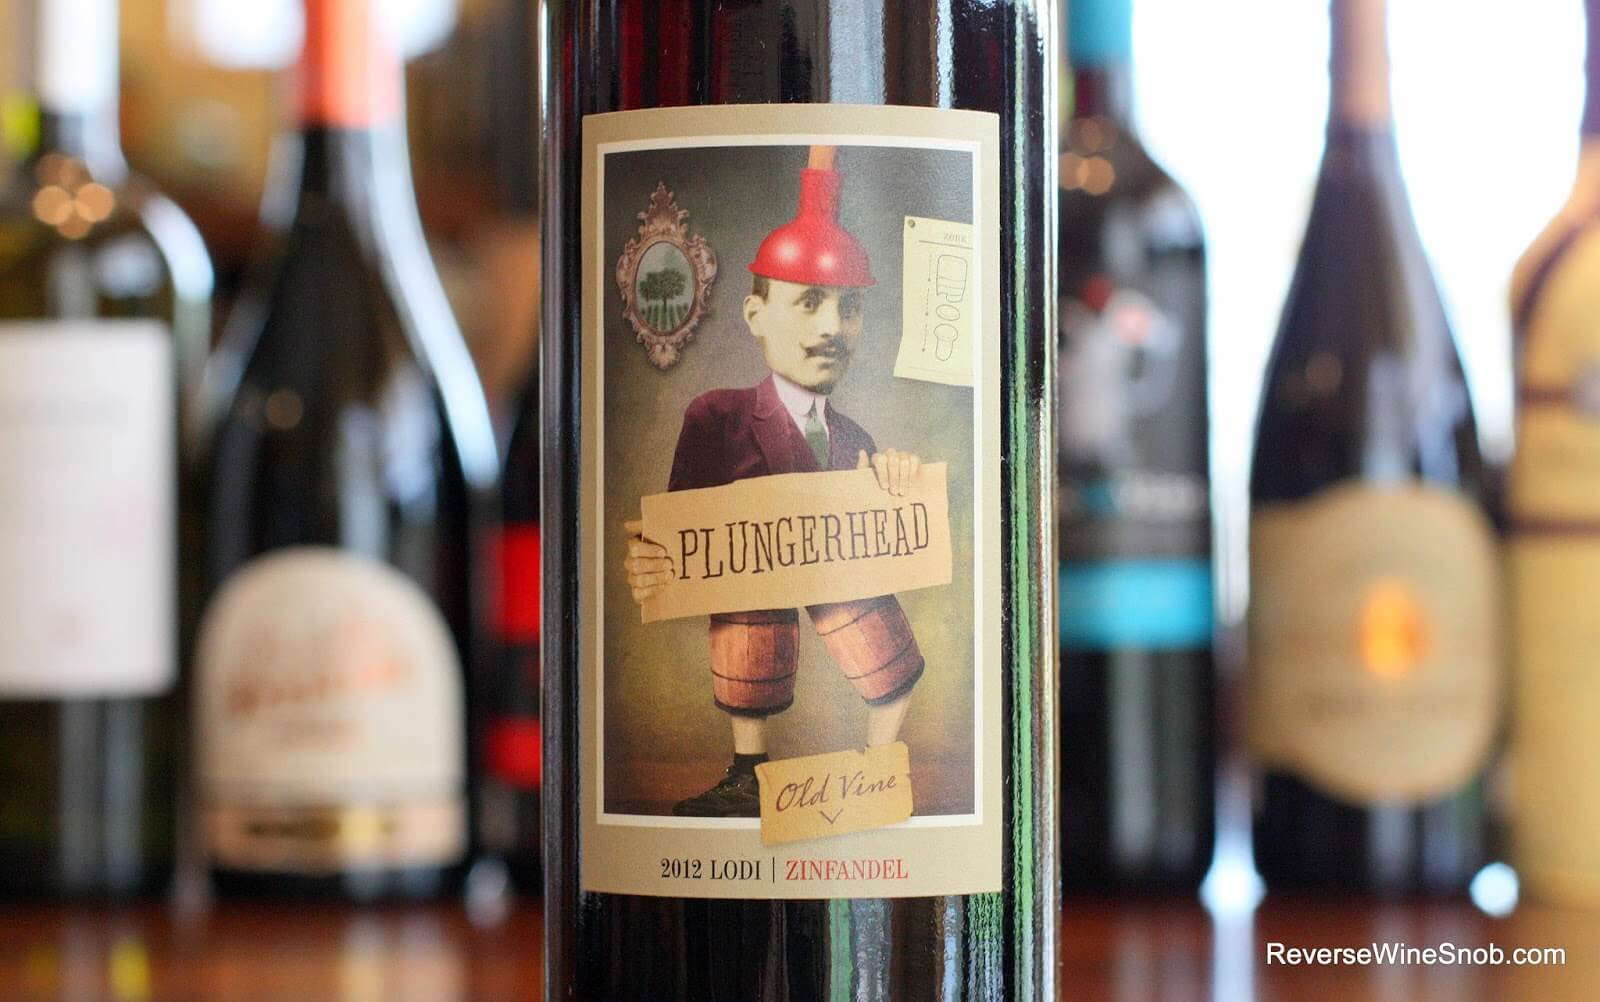 2012-plungerhead-old-vine-lodi-zinfandel